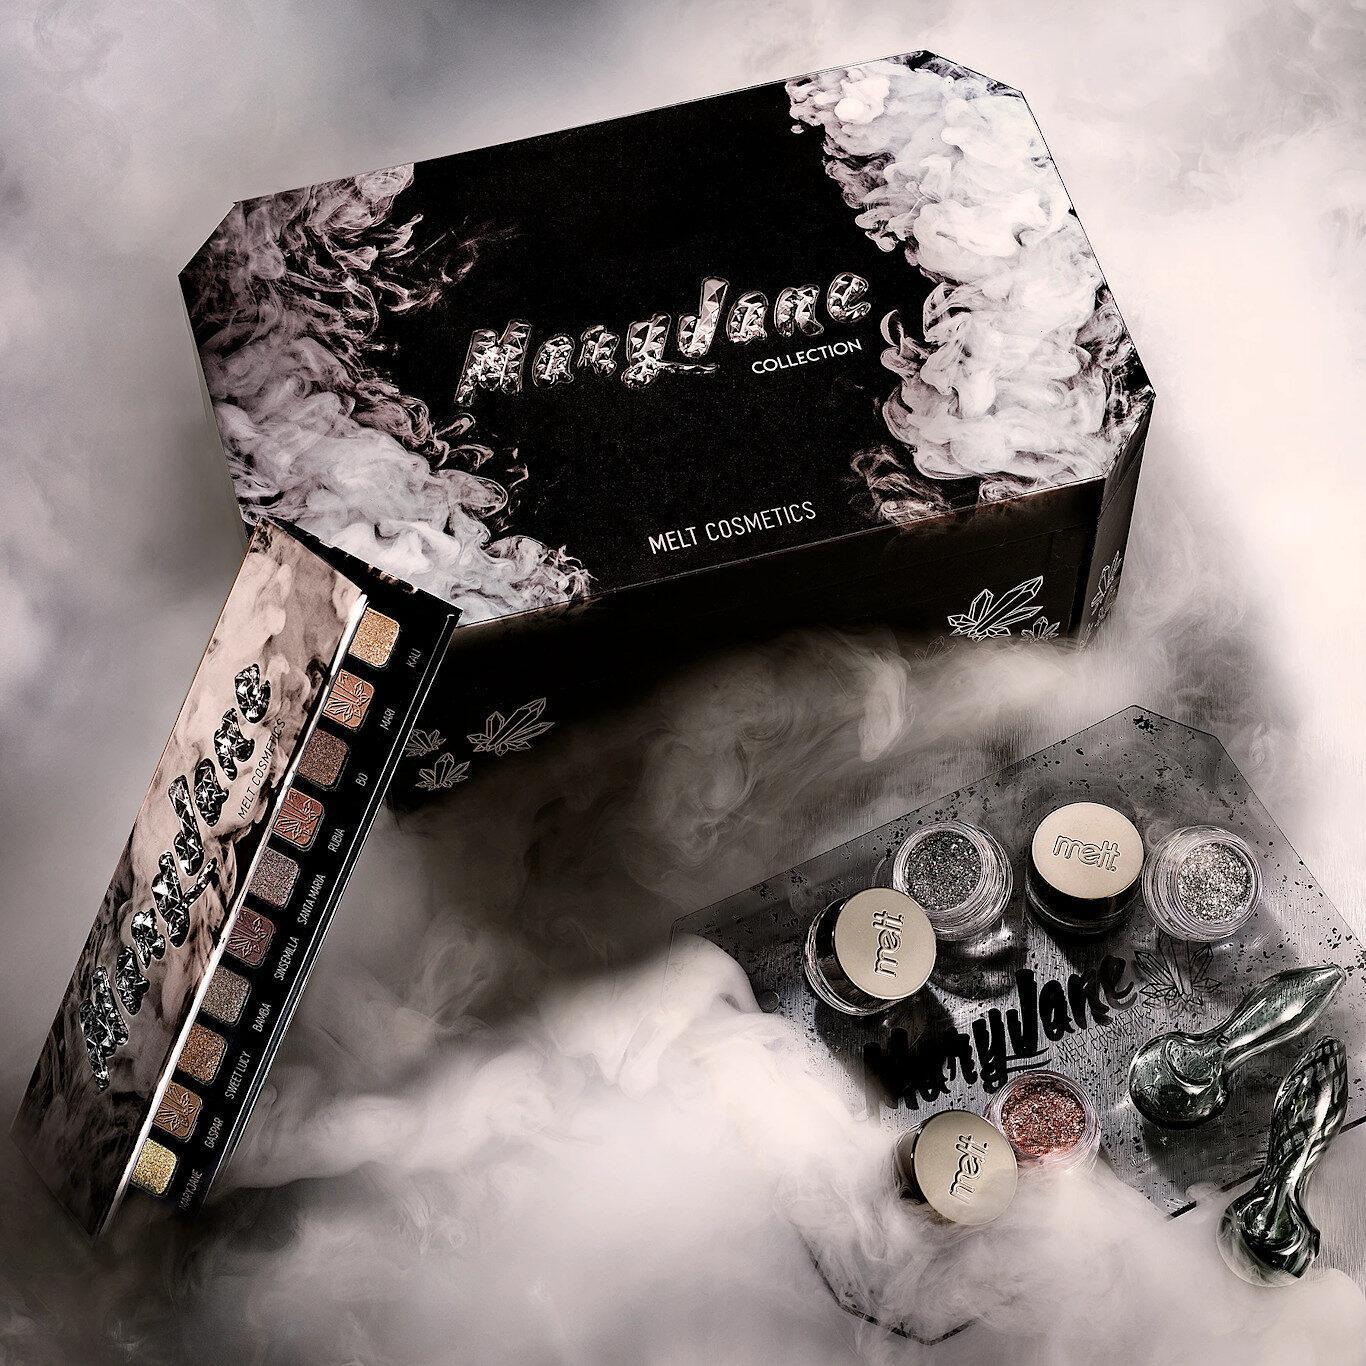 Melt Cosmetics MaryJane Collection Promo Post Cover